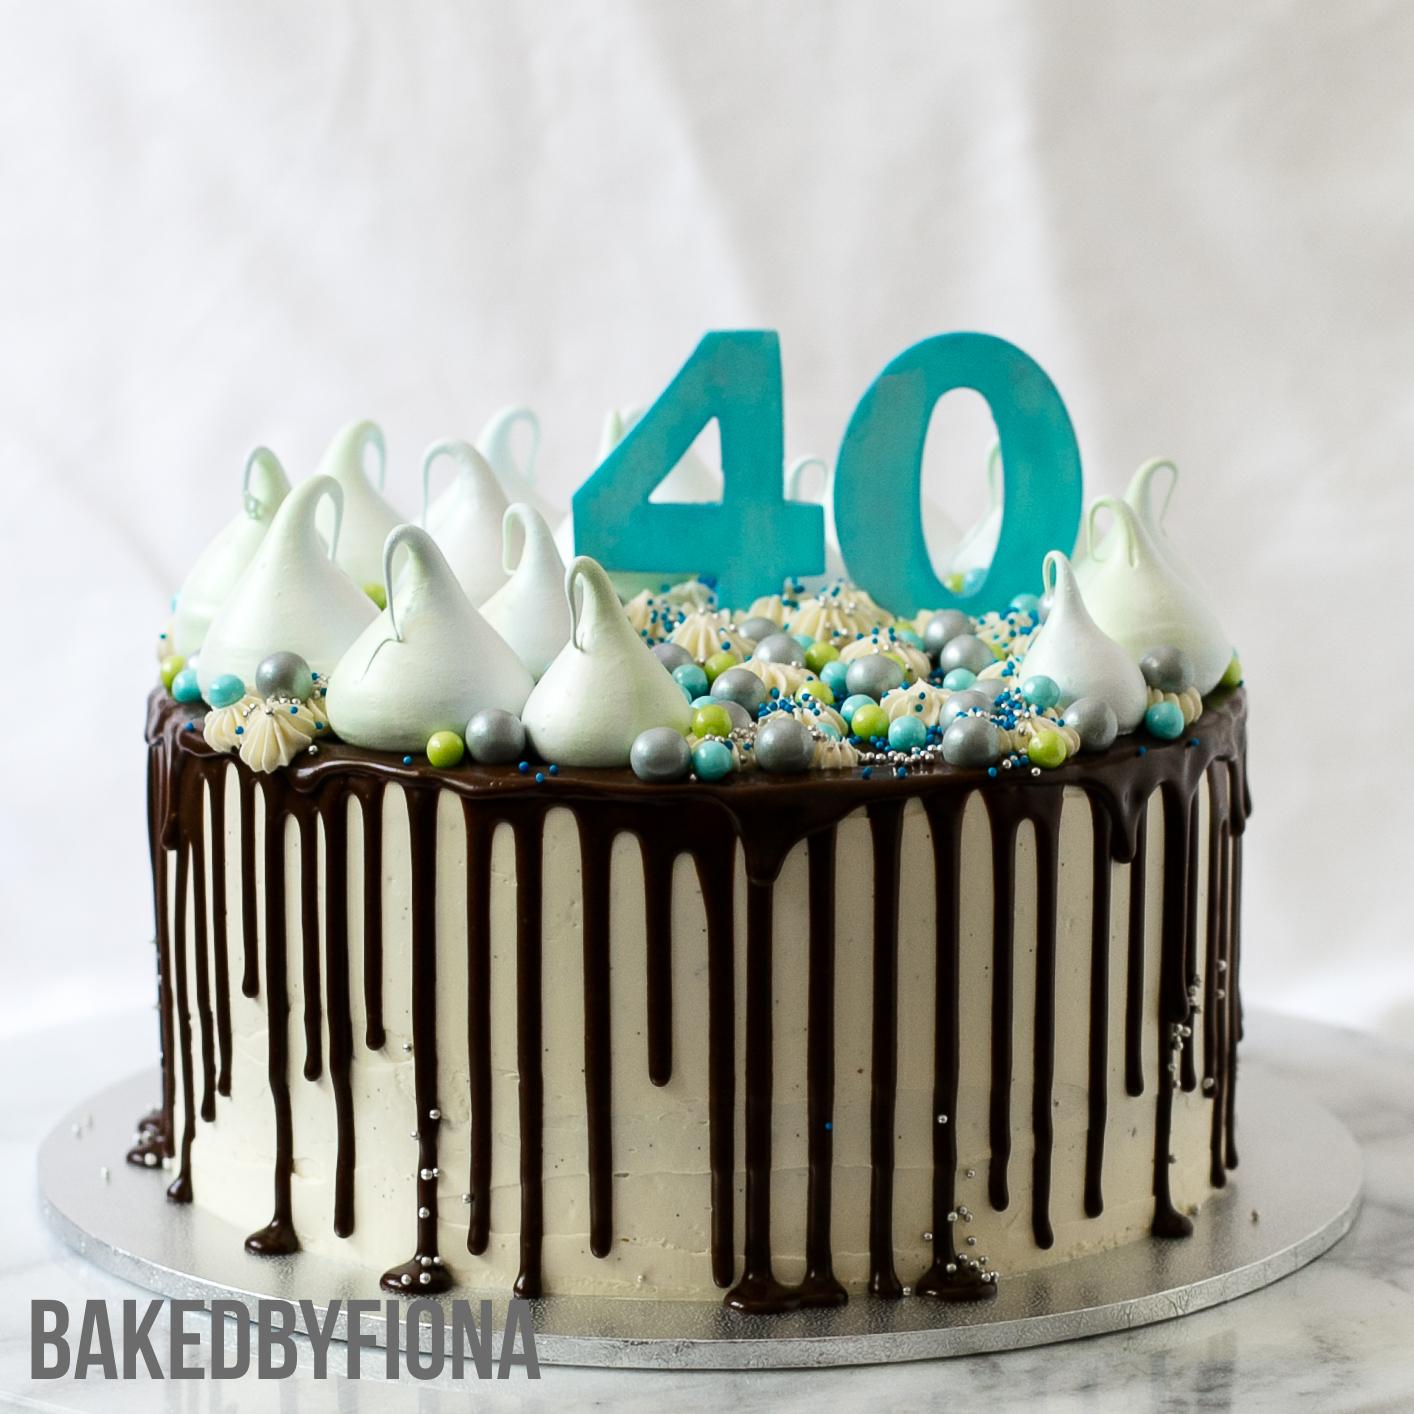 Sydney Cakes, Baked By Fiona 40th birthday cake